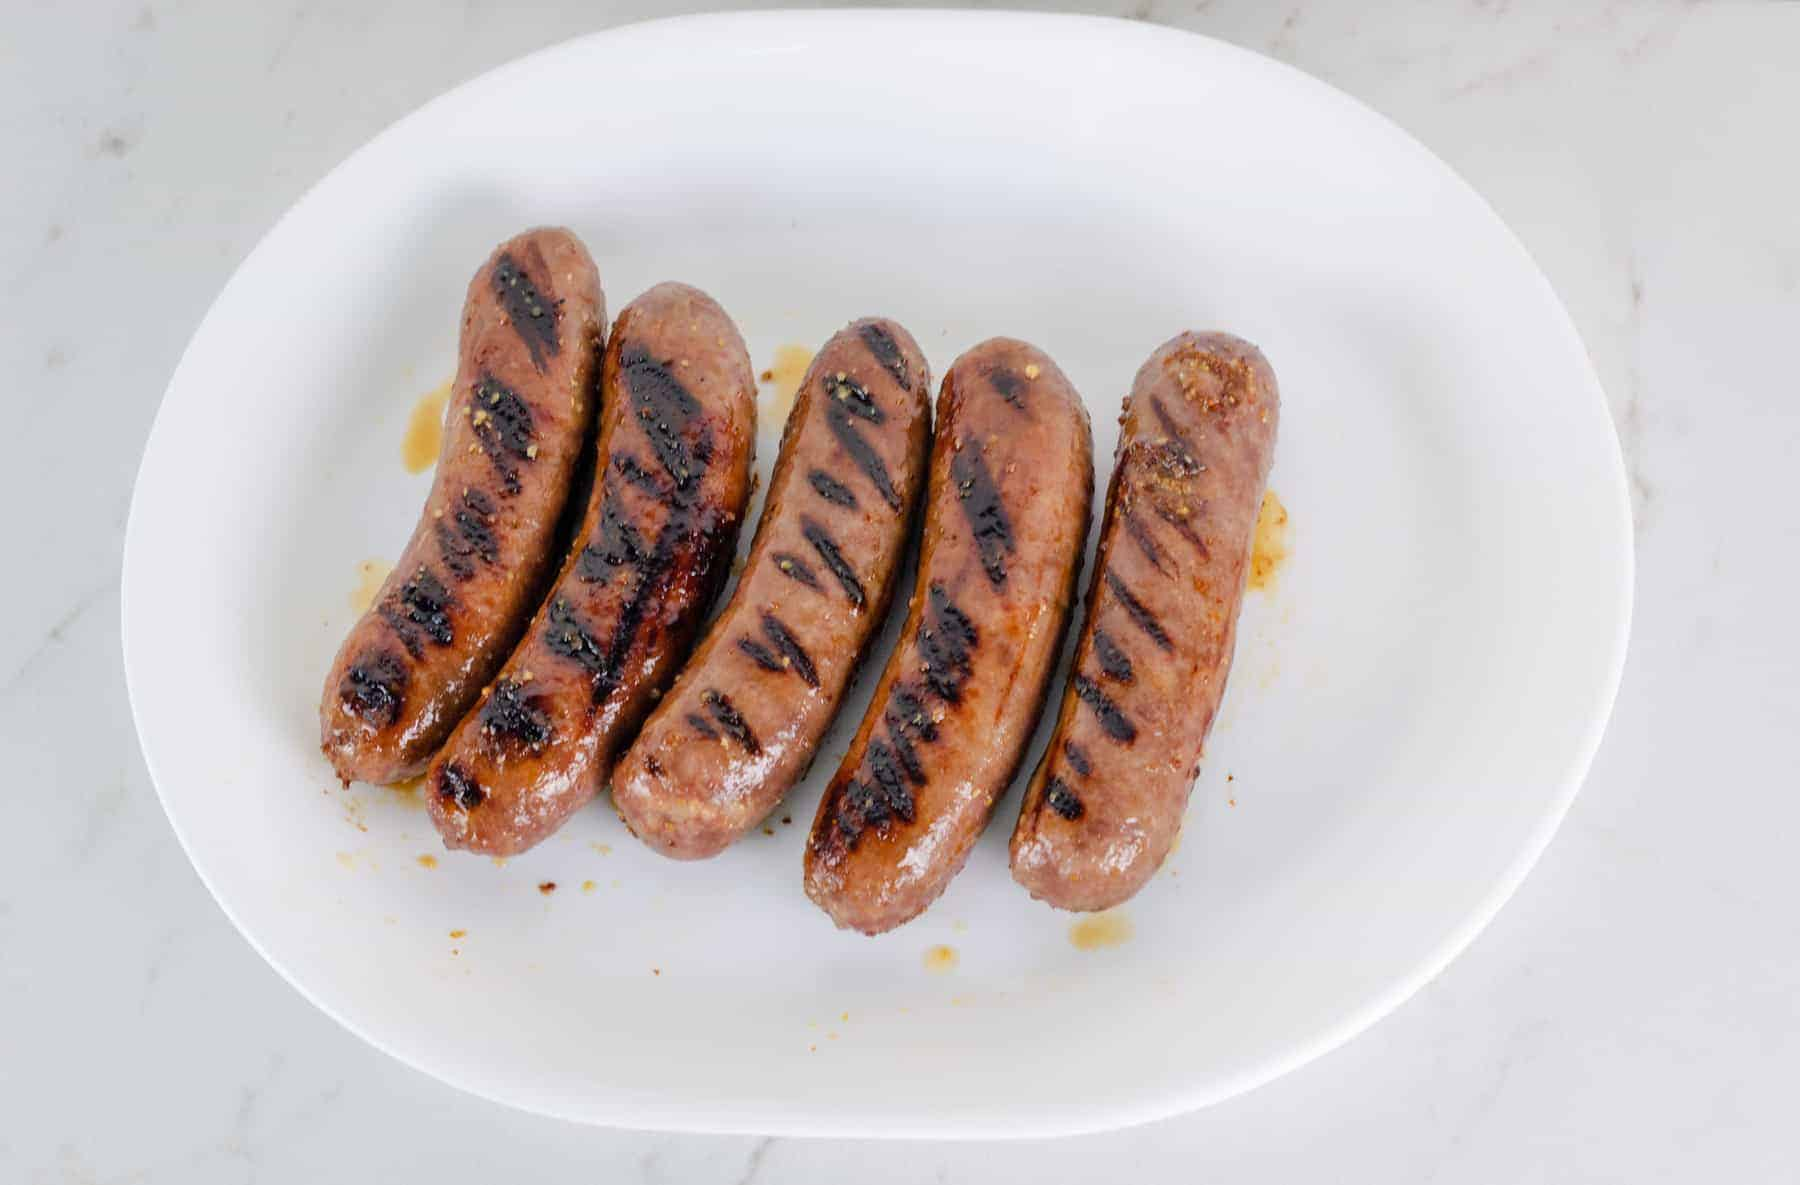 Honey Mustard Beer Glazed Bratwurst Recipe Picture - grilled bratwurst on a platter